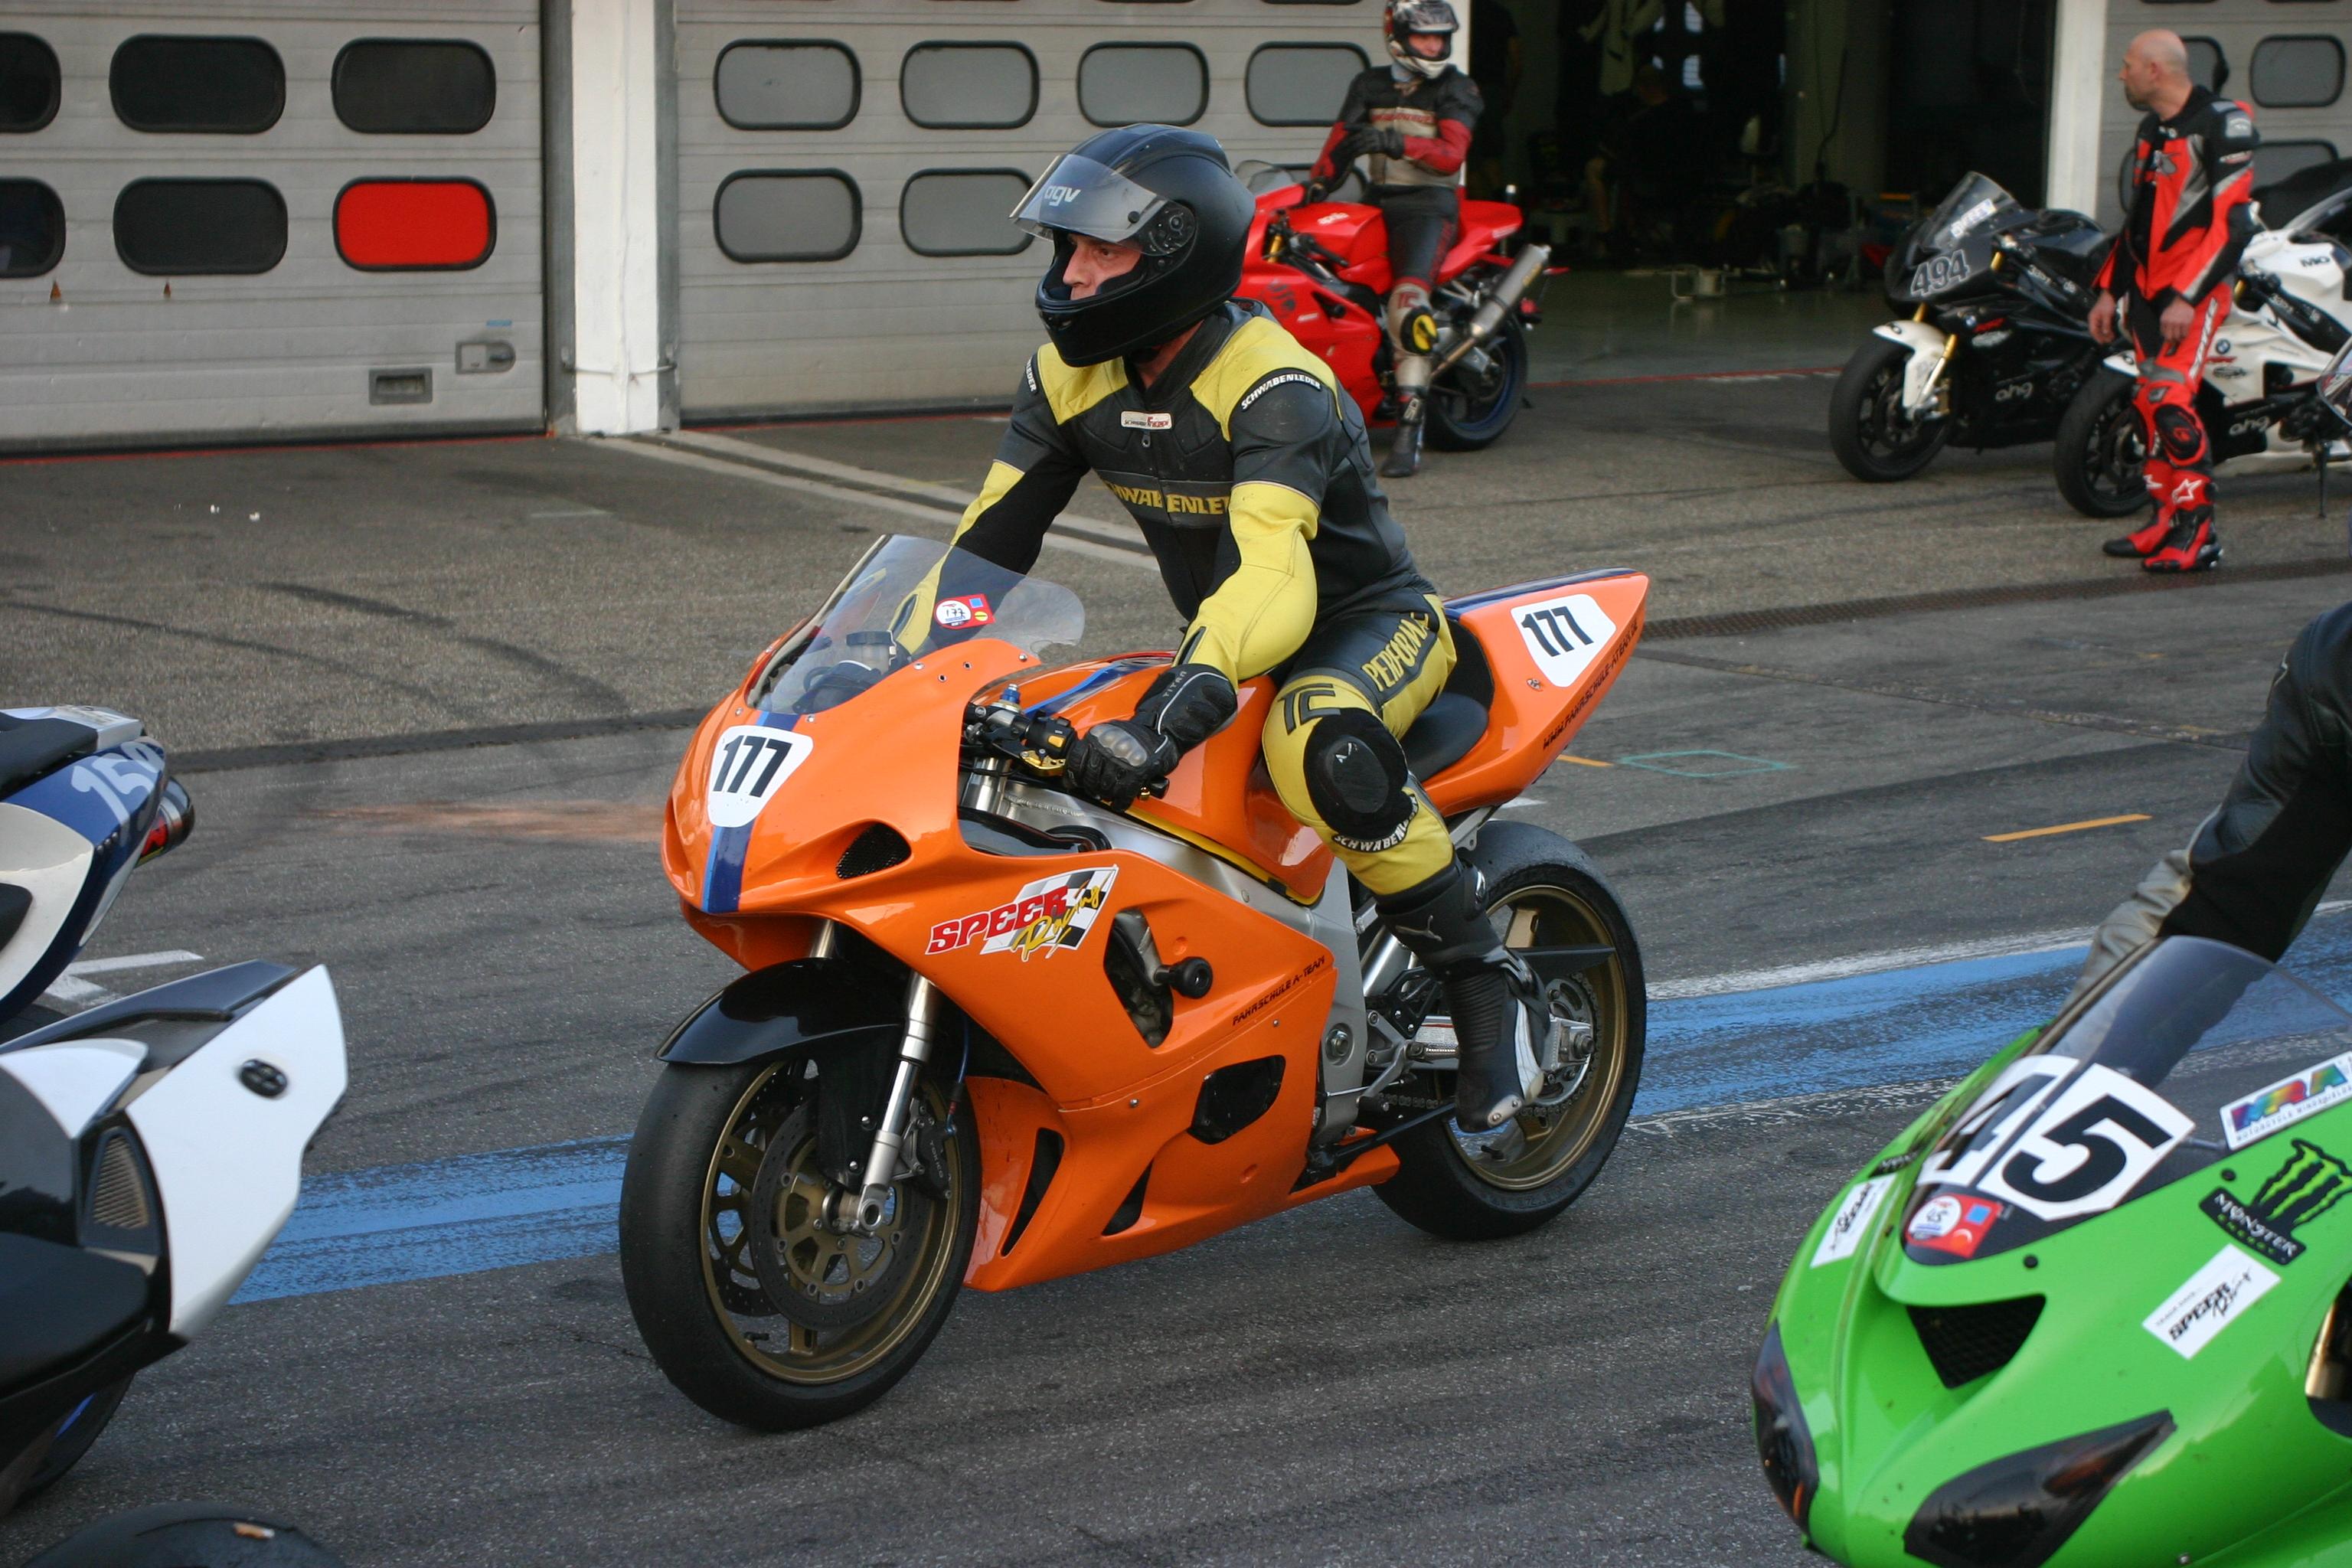 motorrad renne kringel